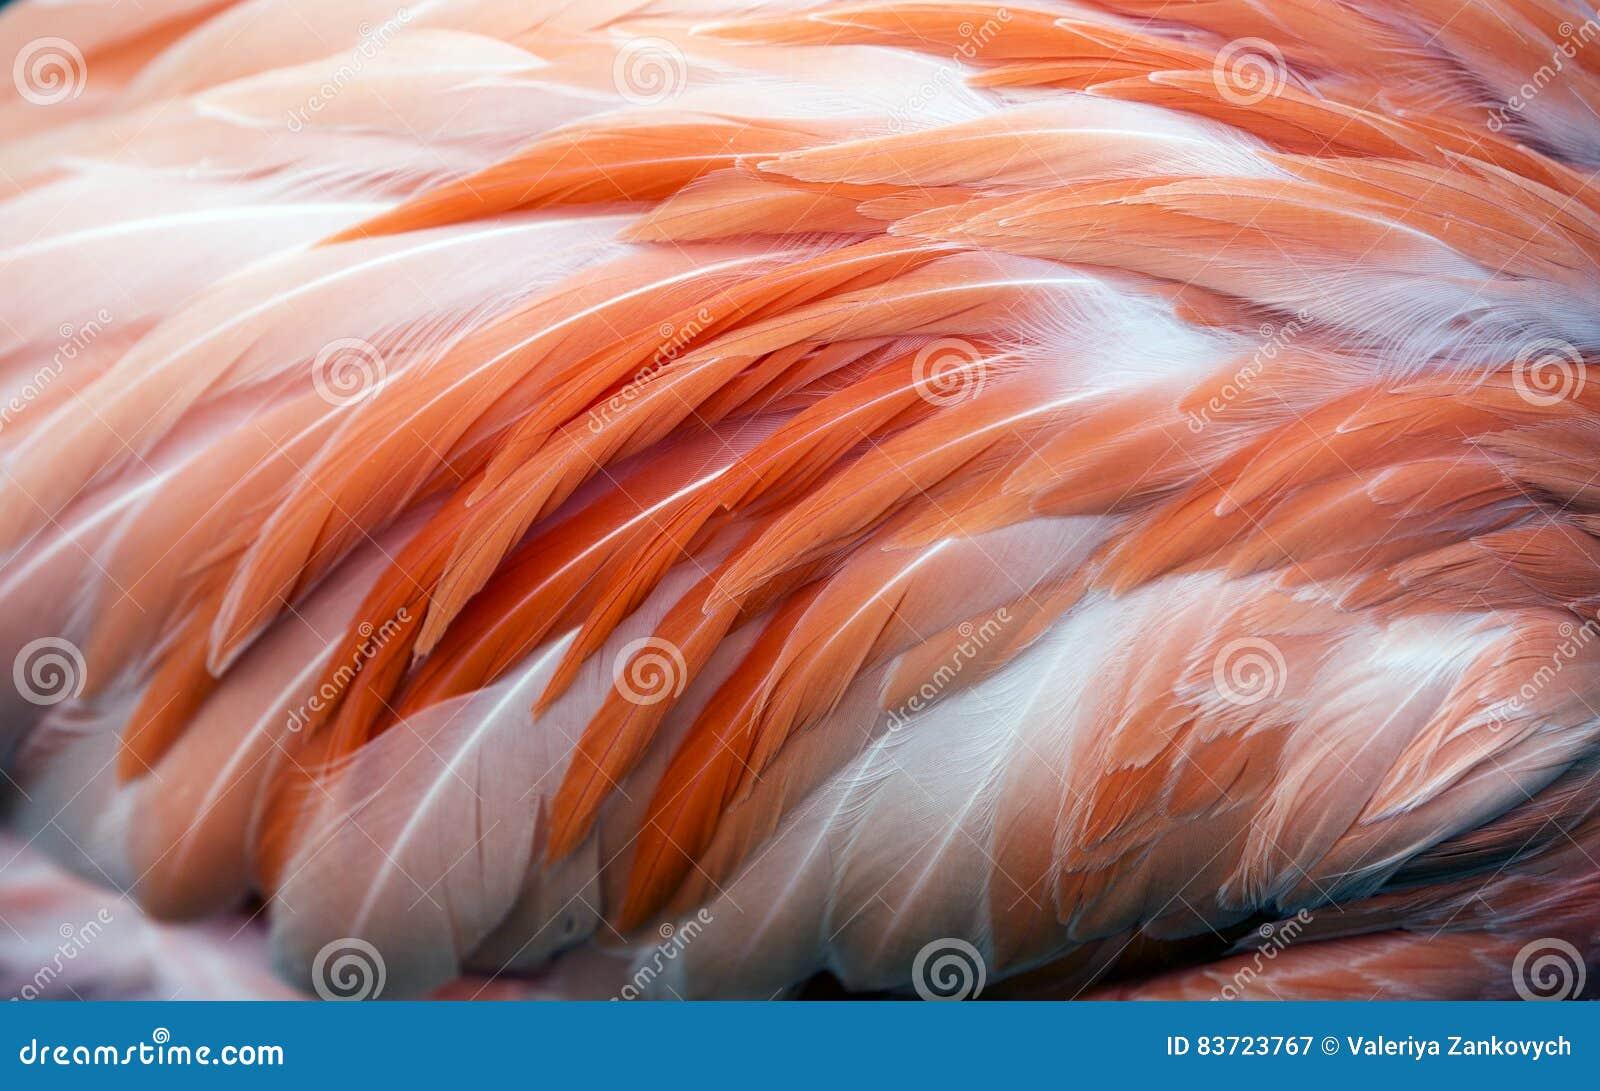 Flamingo Feather Background Stock Photo